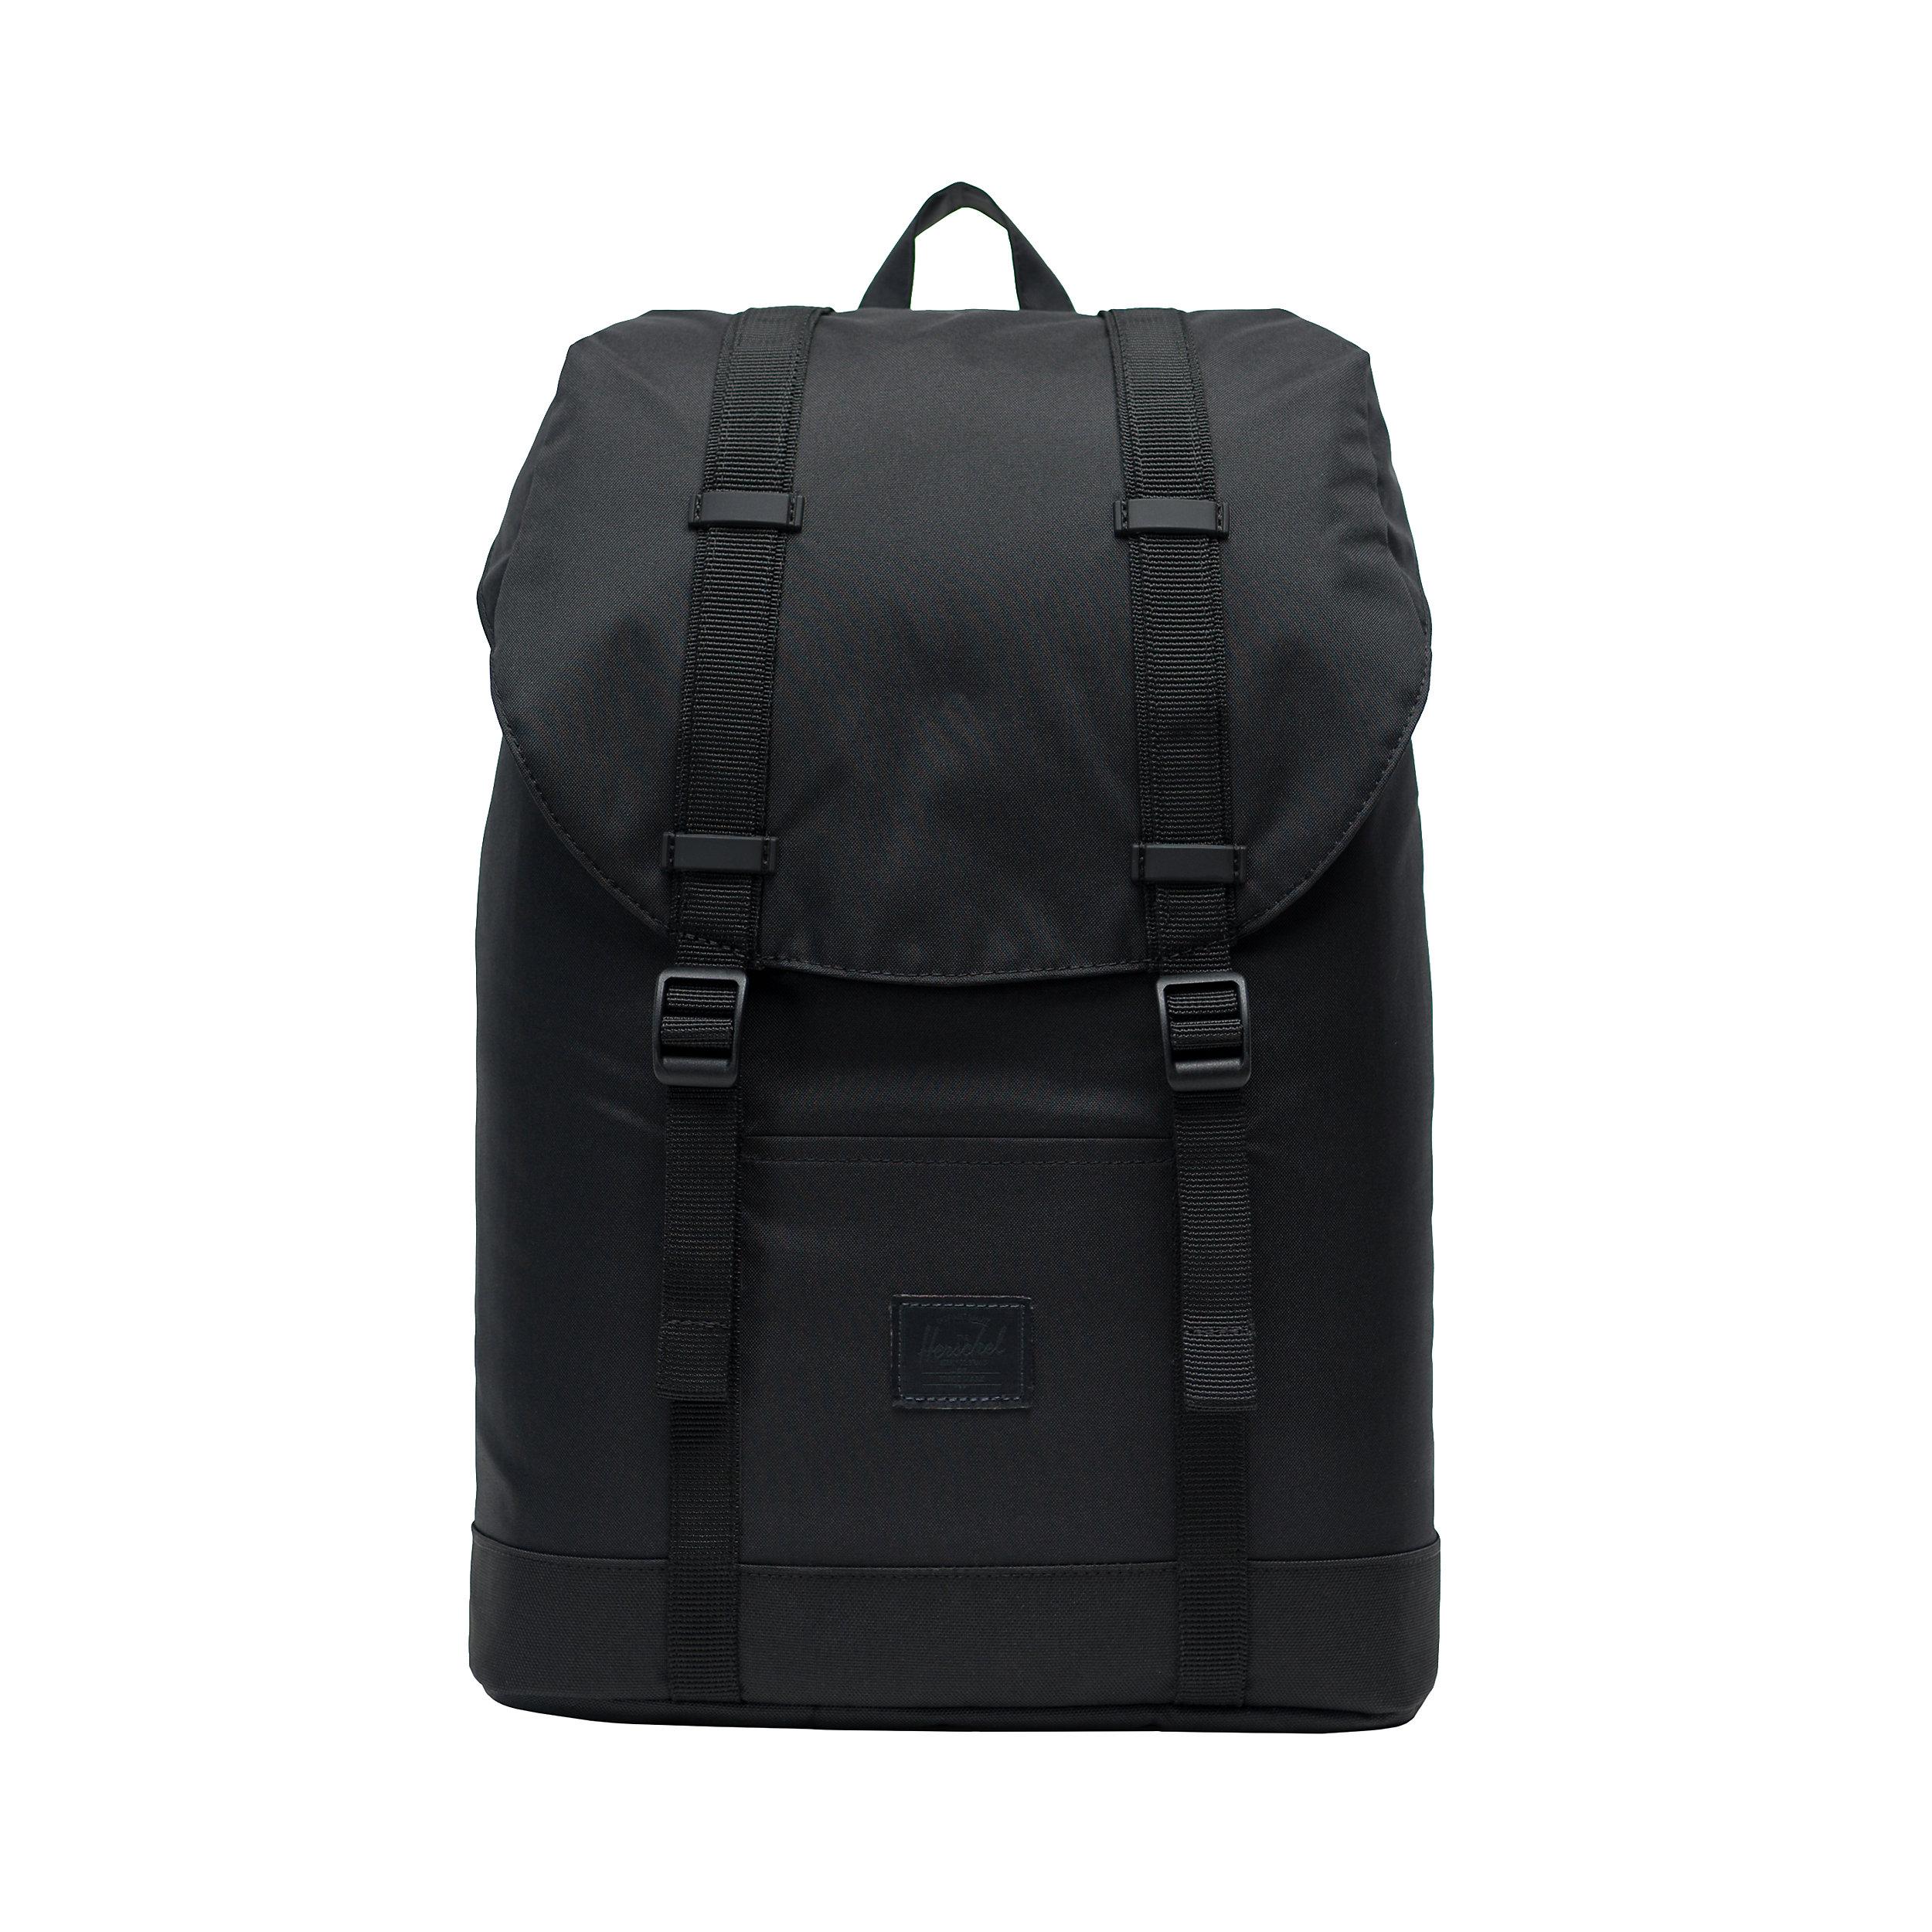 Backpack Retreat Light Mid-Volume 13 Inch Classic Light 14 Liter